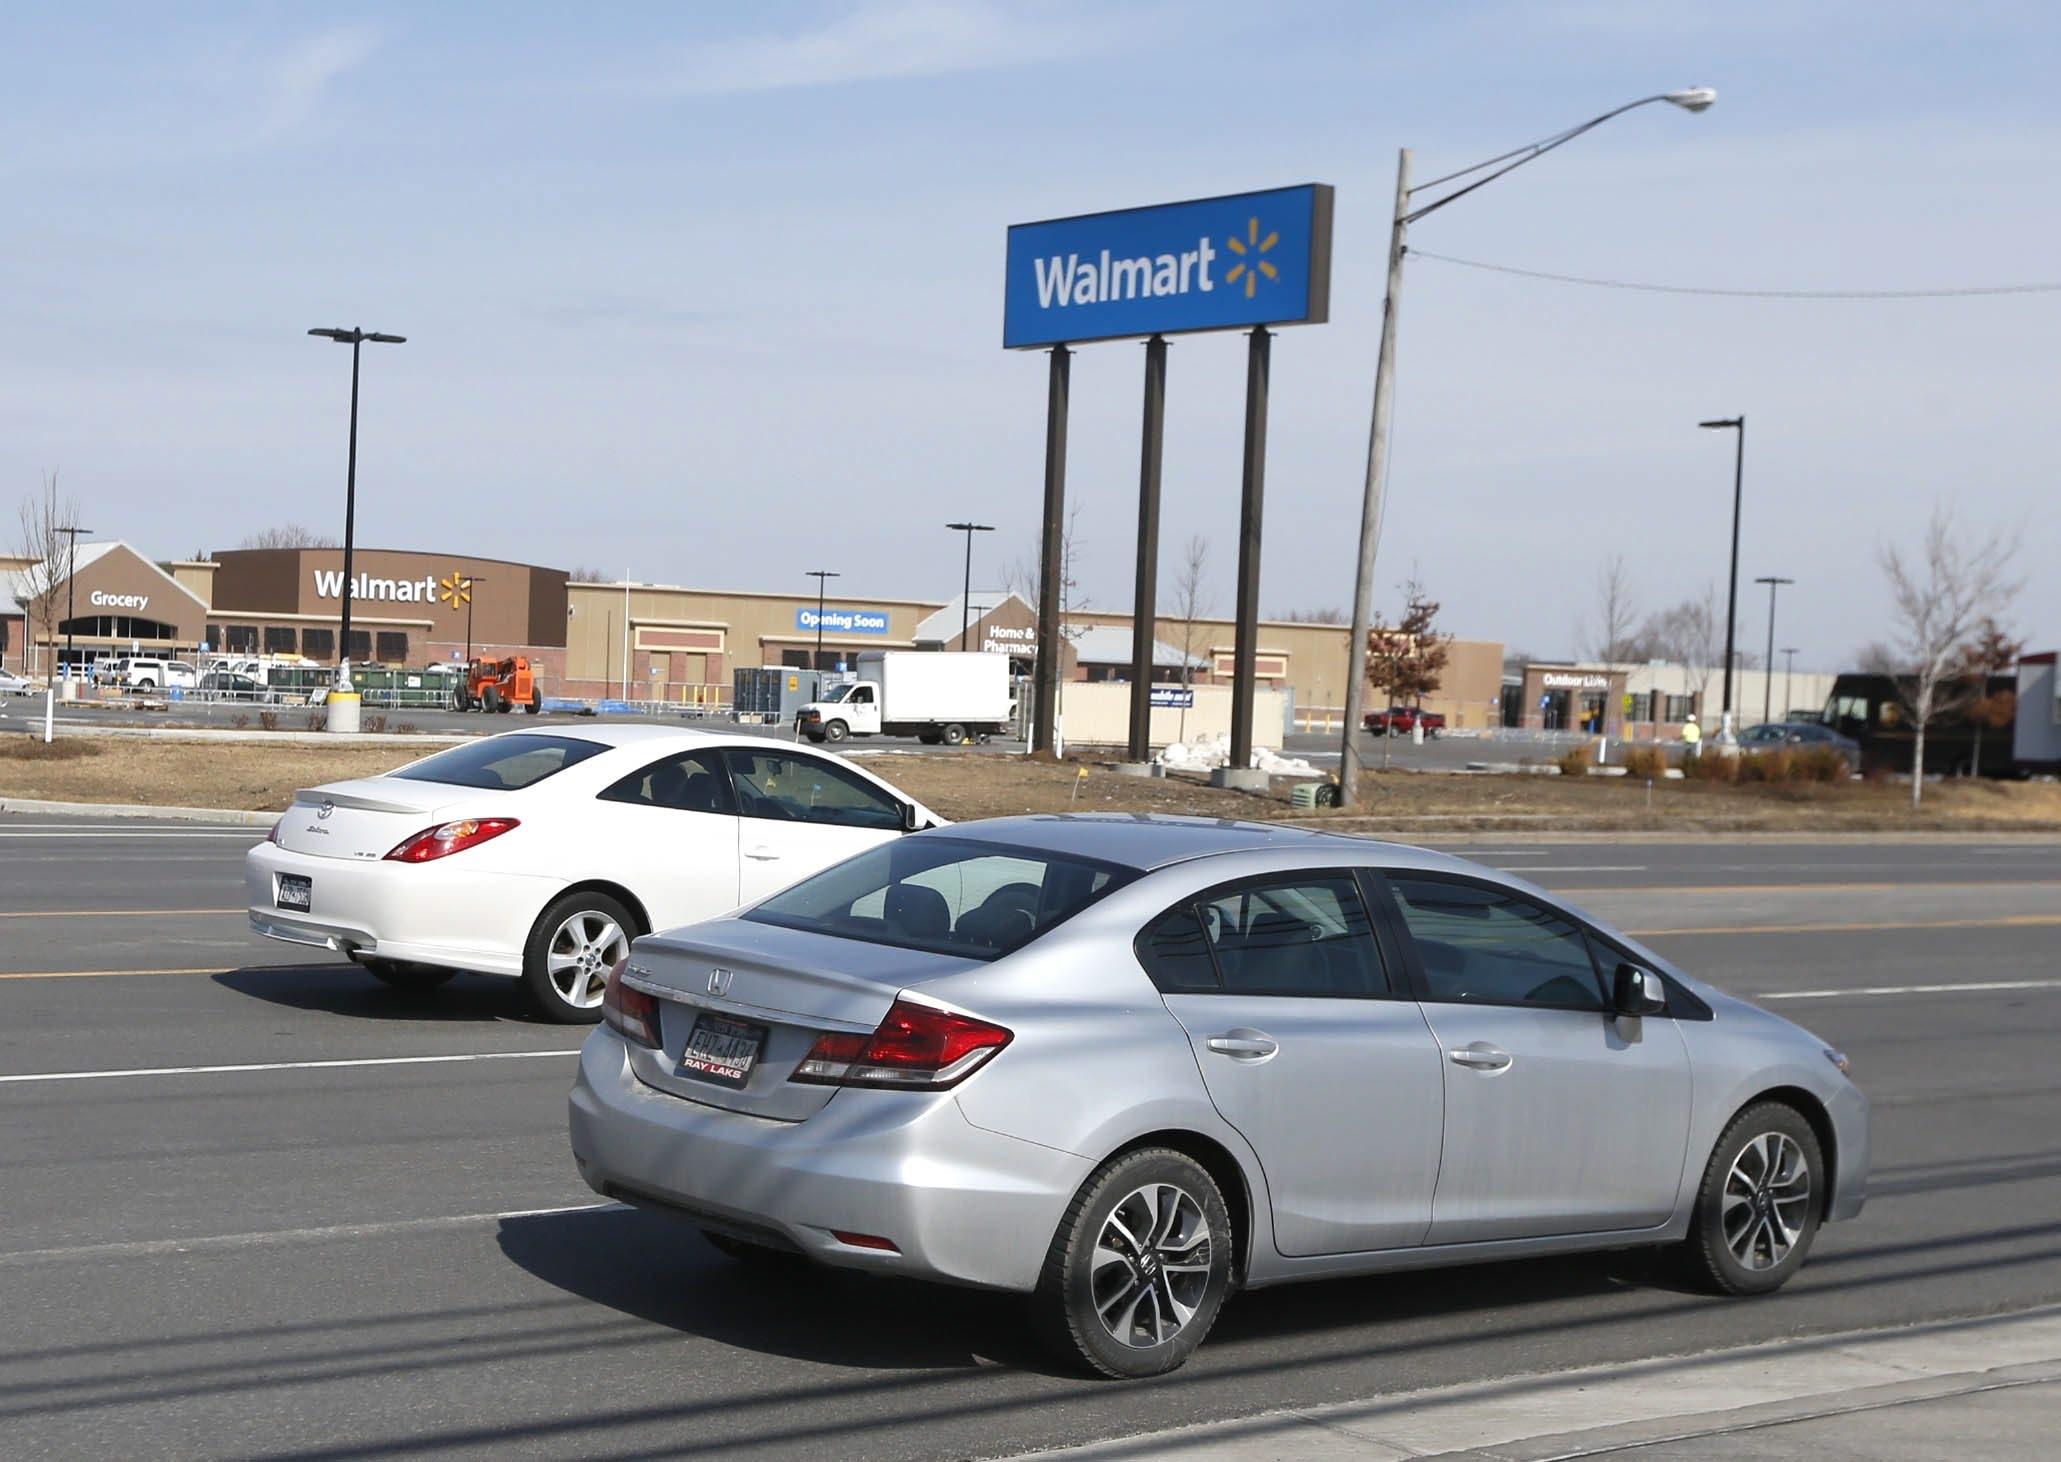 Metro Buses will not have direct access to the new Walmart on Walden in Cheektowaga. (Robert Kirkham/Buffalo News)